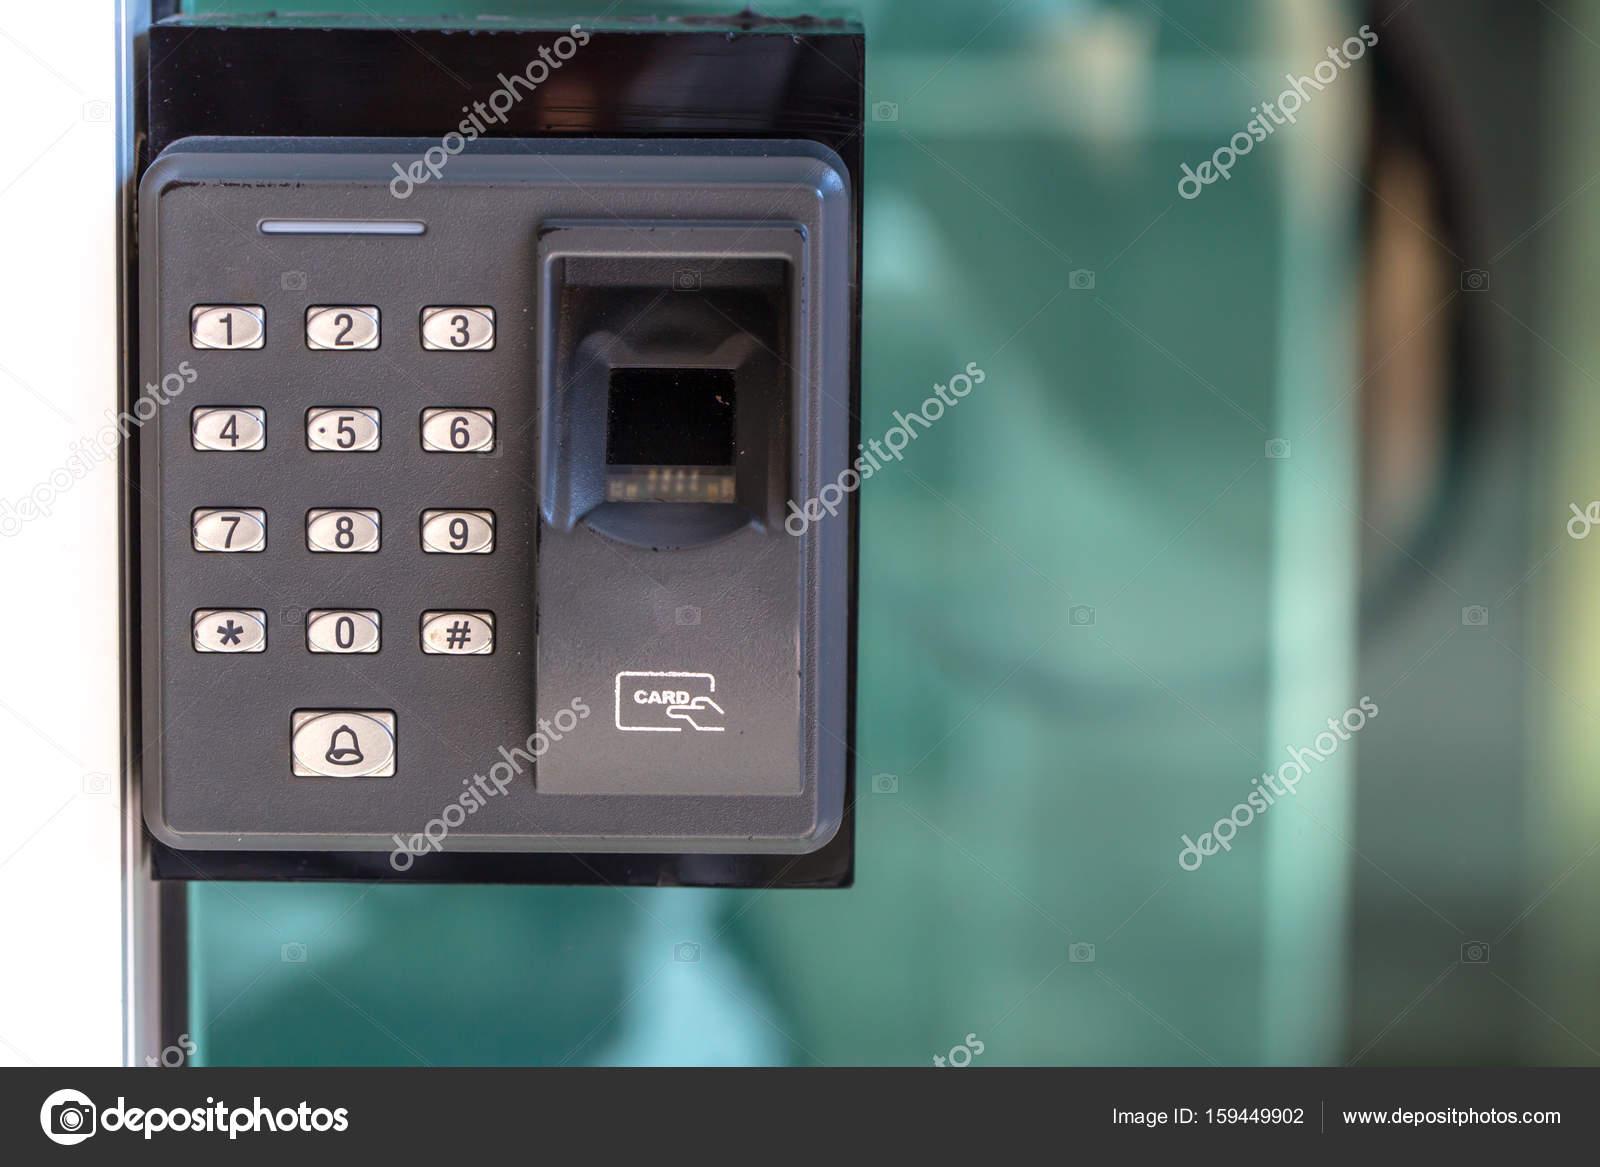 Finger scan security door key lock. u2014 Stock Photo & finger scan security door key lock. u2014 Stock Photo © coffeekai #159449902